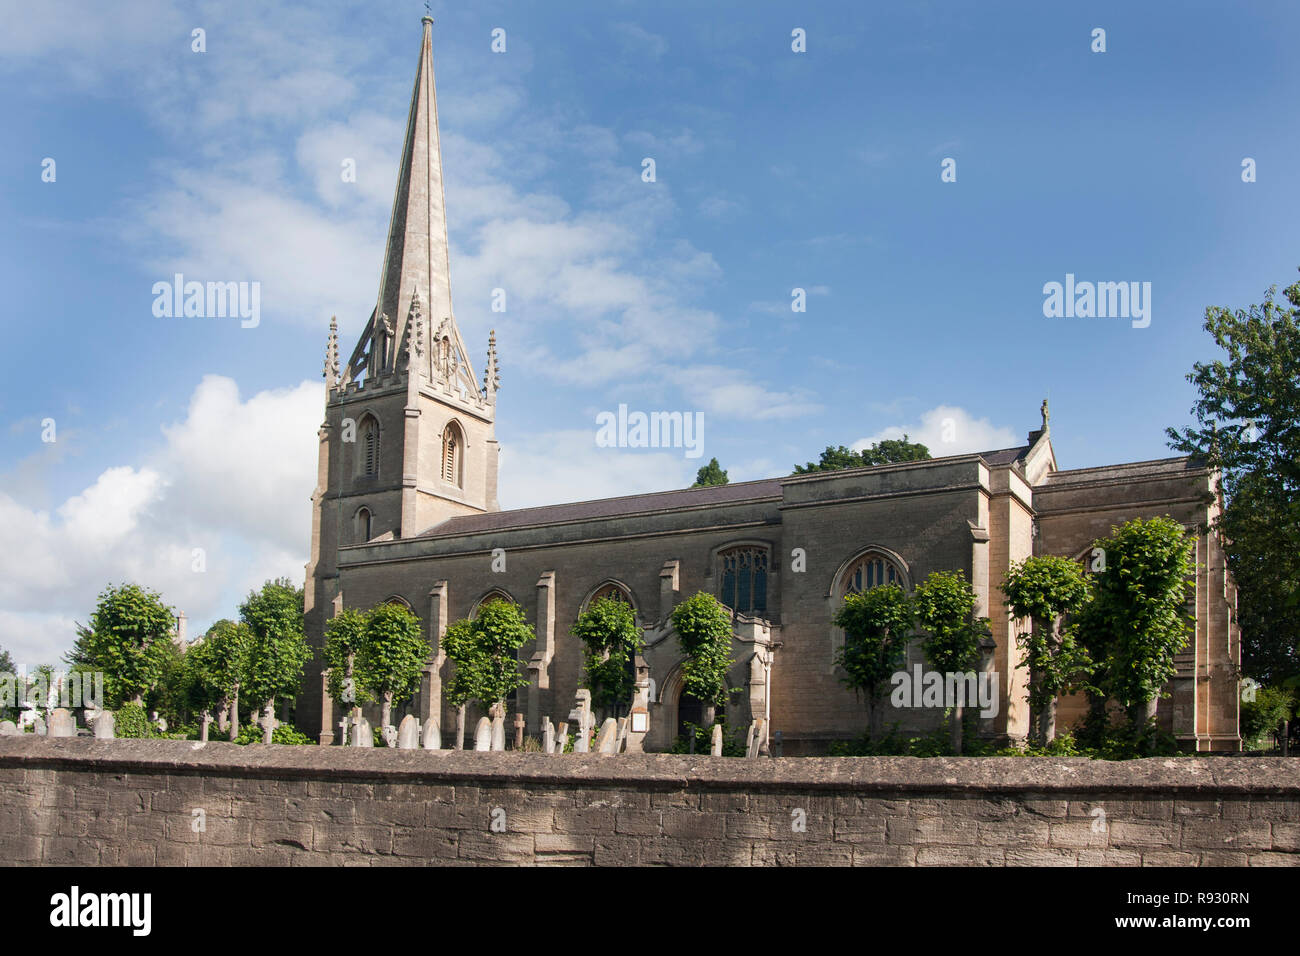 Christ Church Anglican en Conservation District de Bradford-on-Avon, Wiltshire. Bradford doyenné du diocèse de Salisbury. Photo Stock